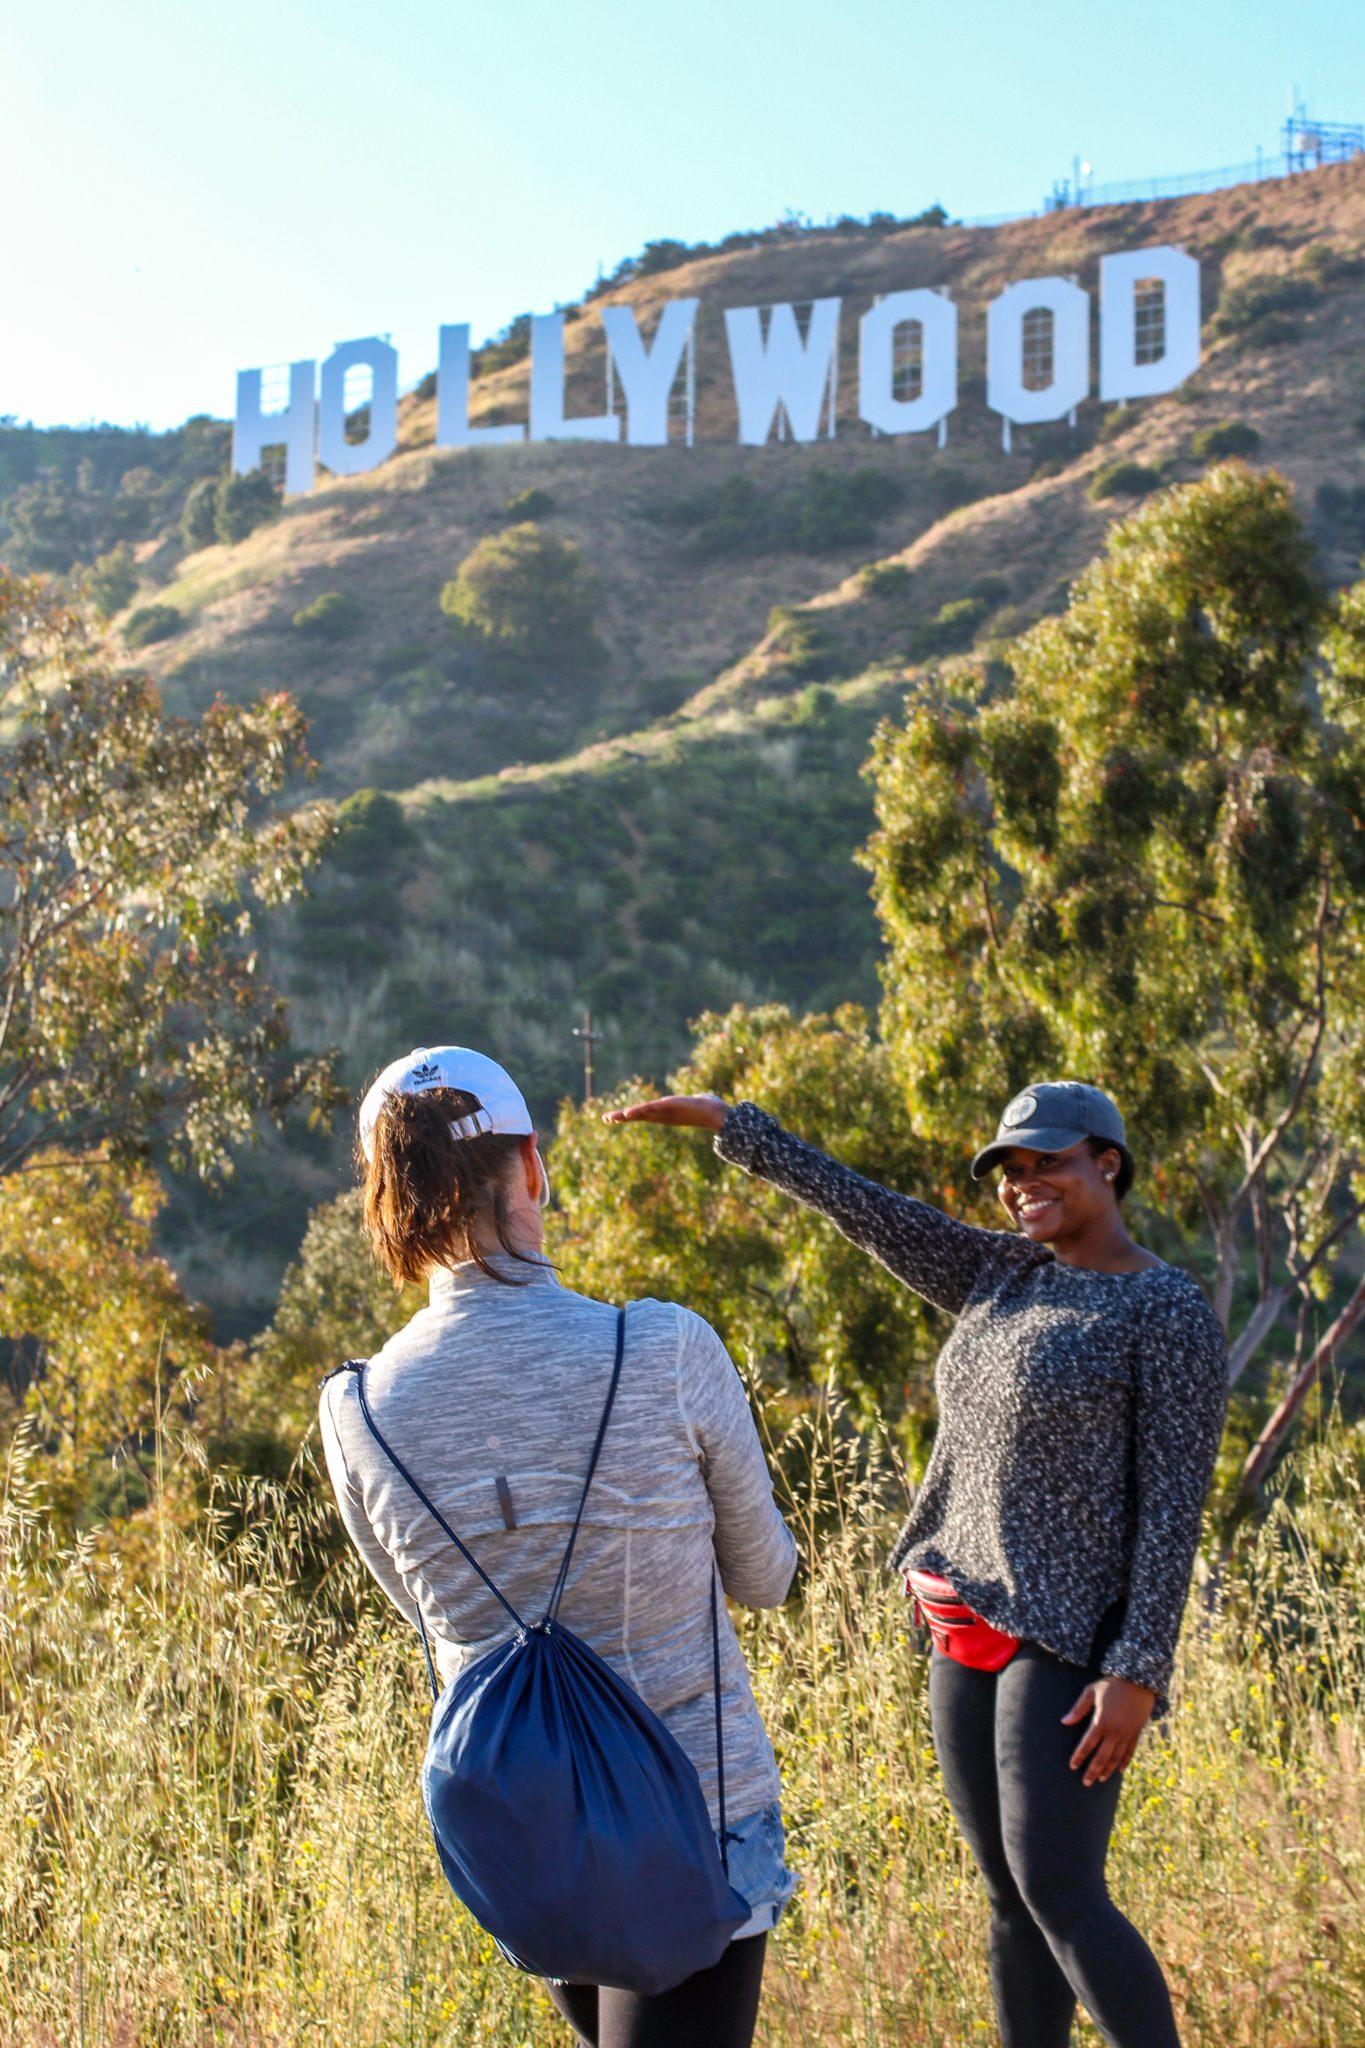 Shooting photo Hollywood